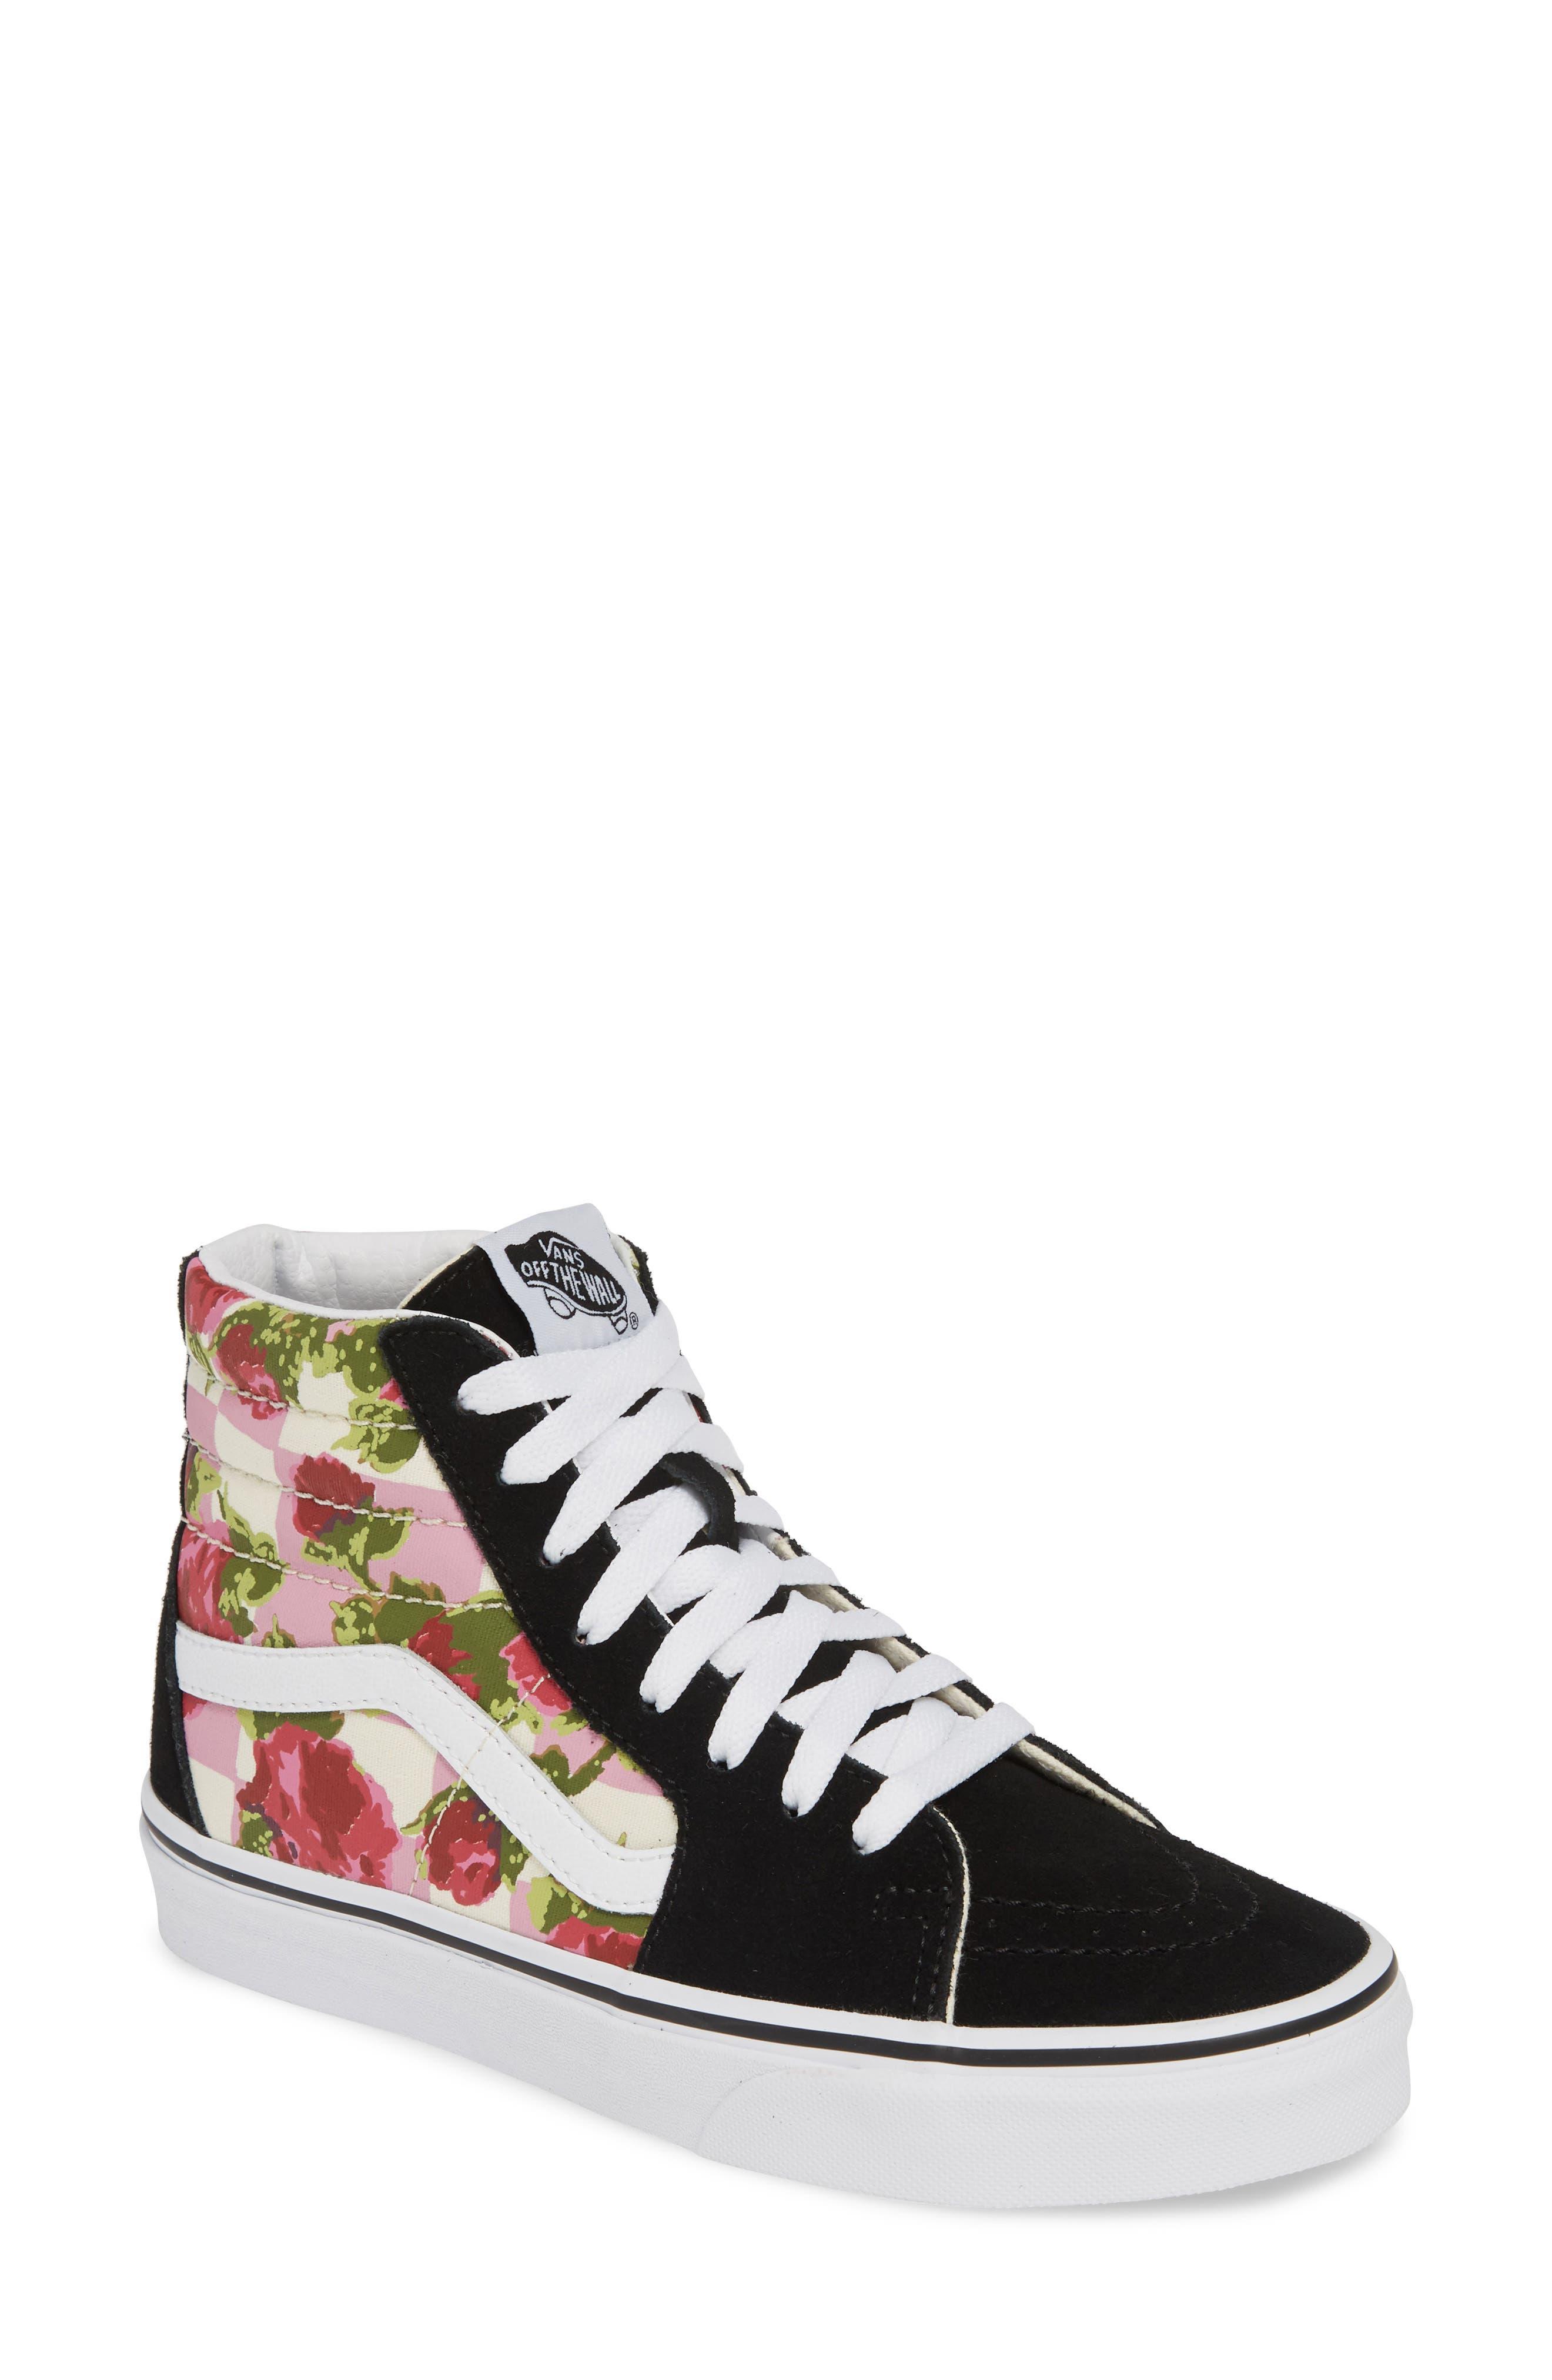 VANS, Sk8-Hi Floral Sneaker, Main thumbnail 1, color, FLORAL MULTI/ TRUE WHITE